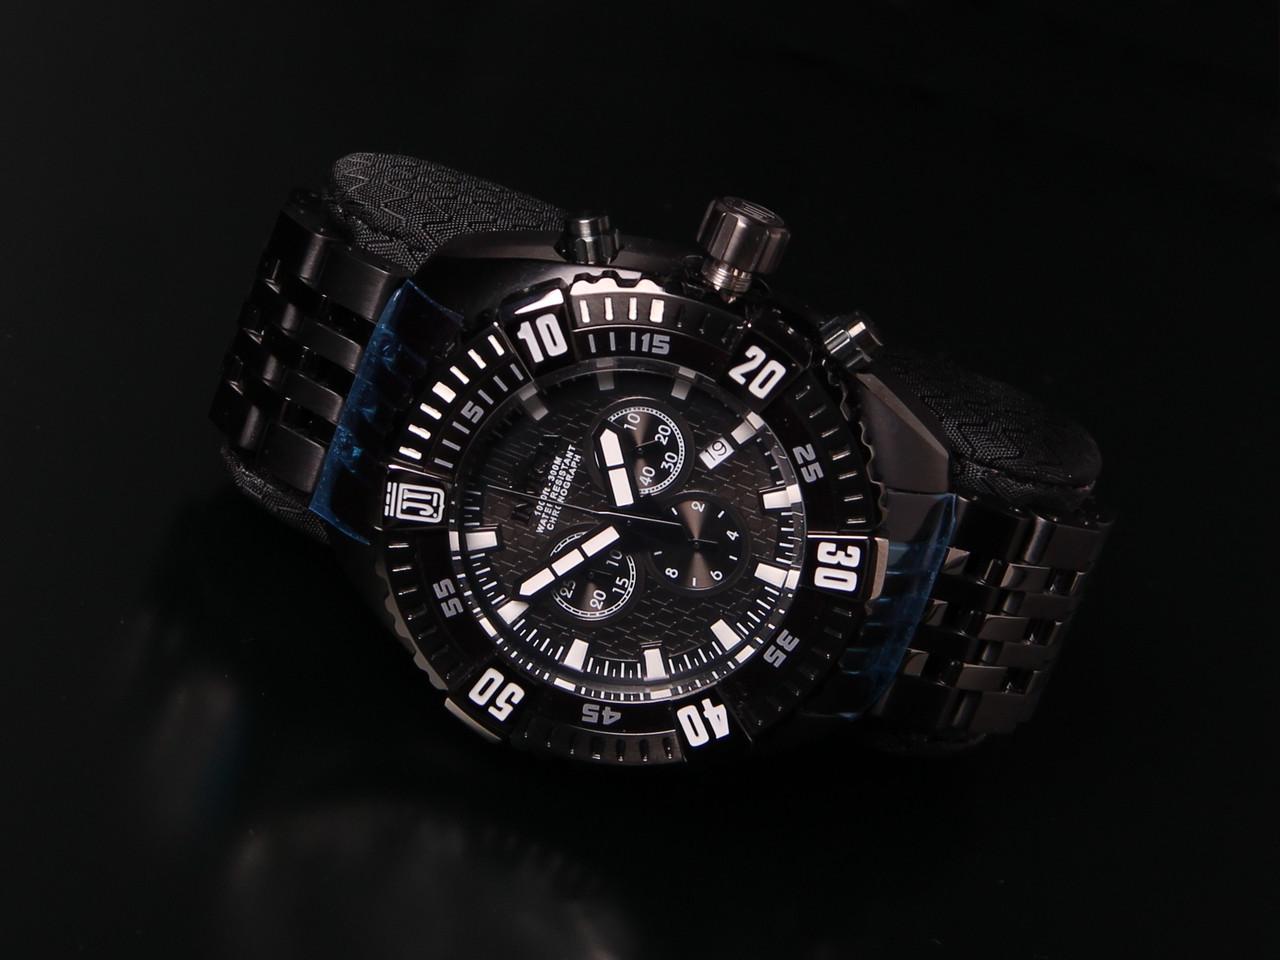 81523d91db88 Мужские часы Invicta 16303 Jason Taylor, Limited Edition - ФЛП Костюшко в  Харькове